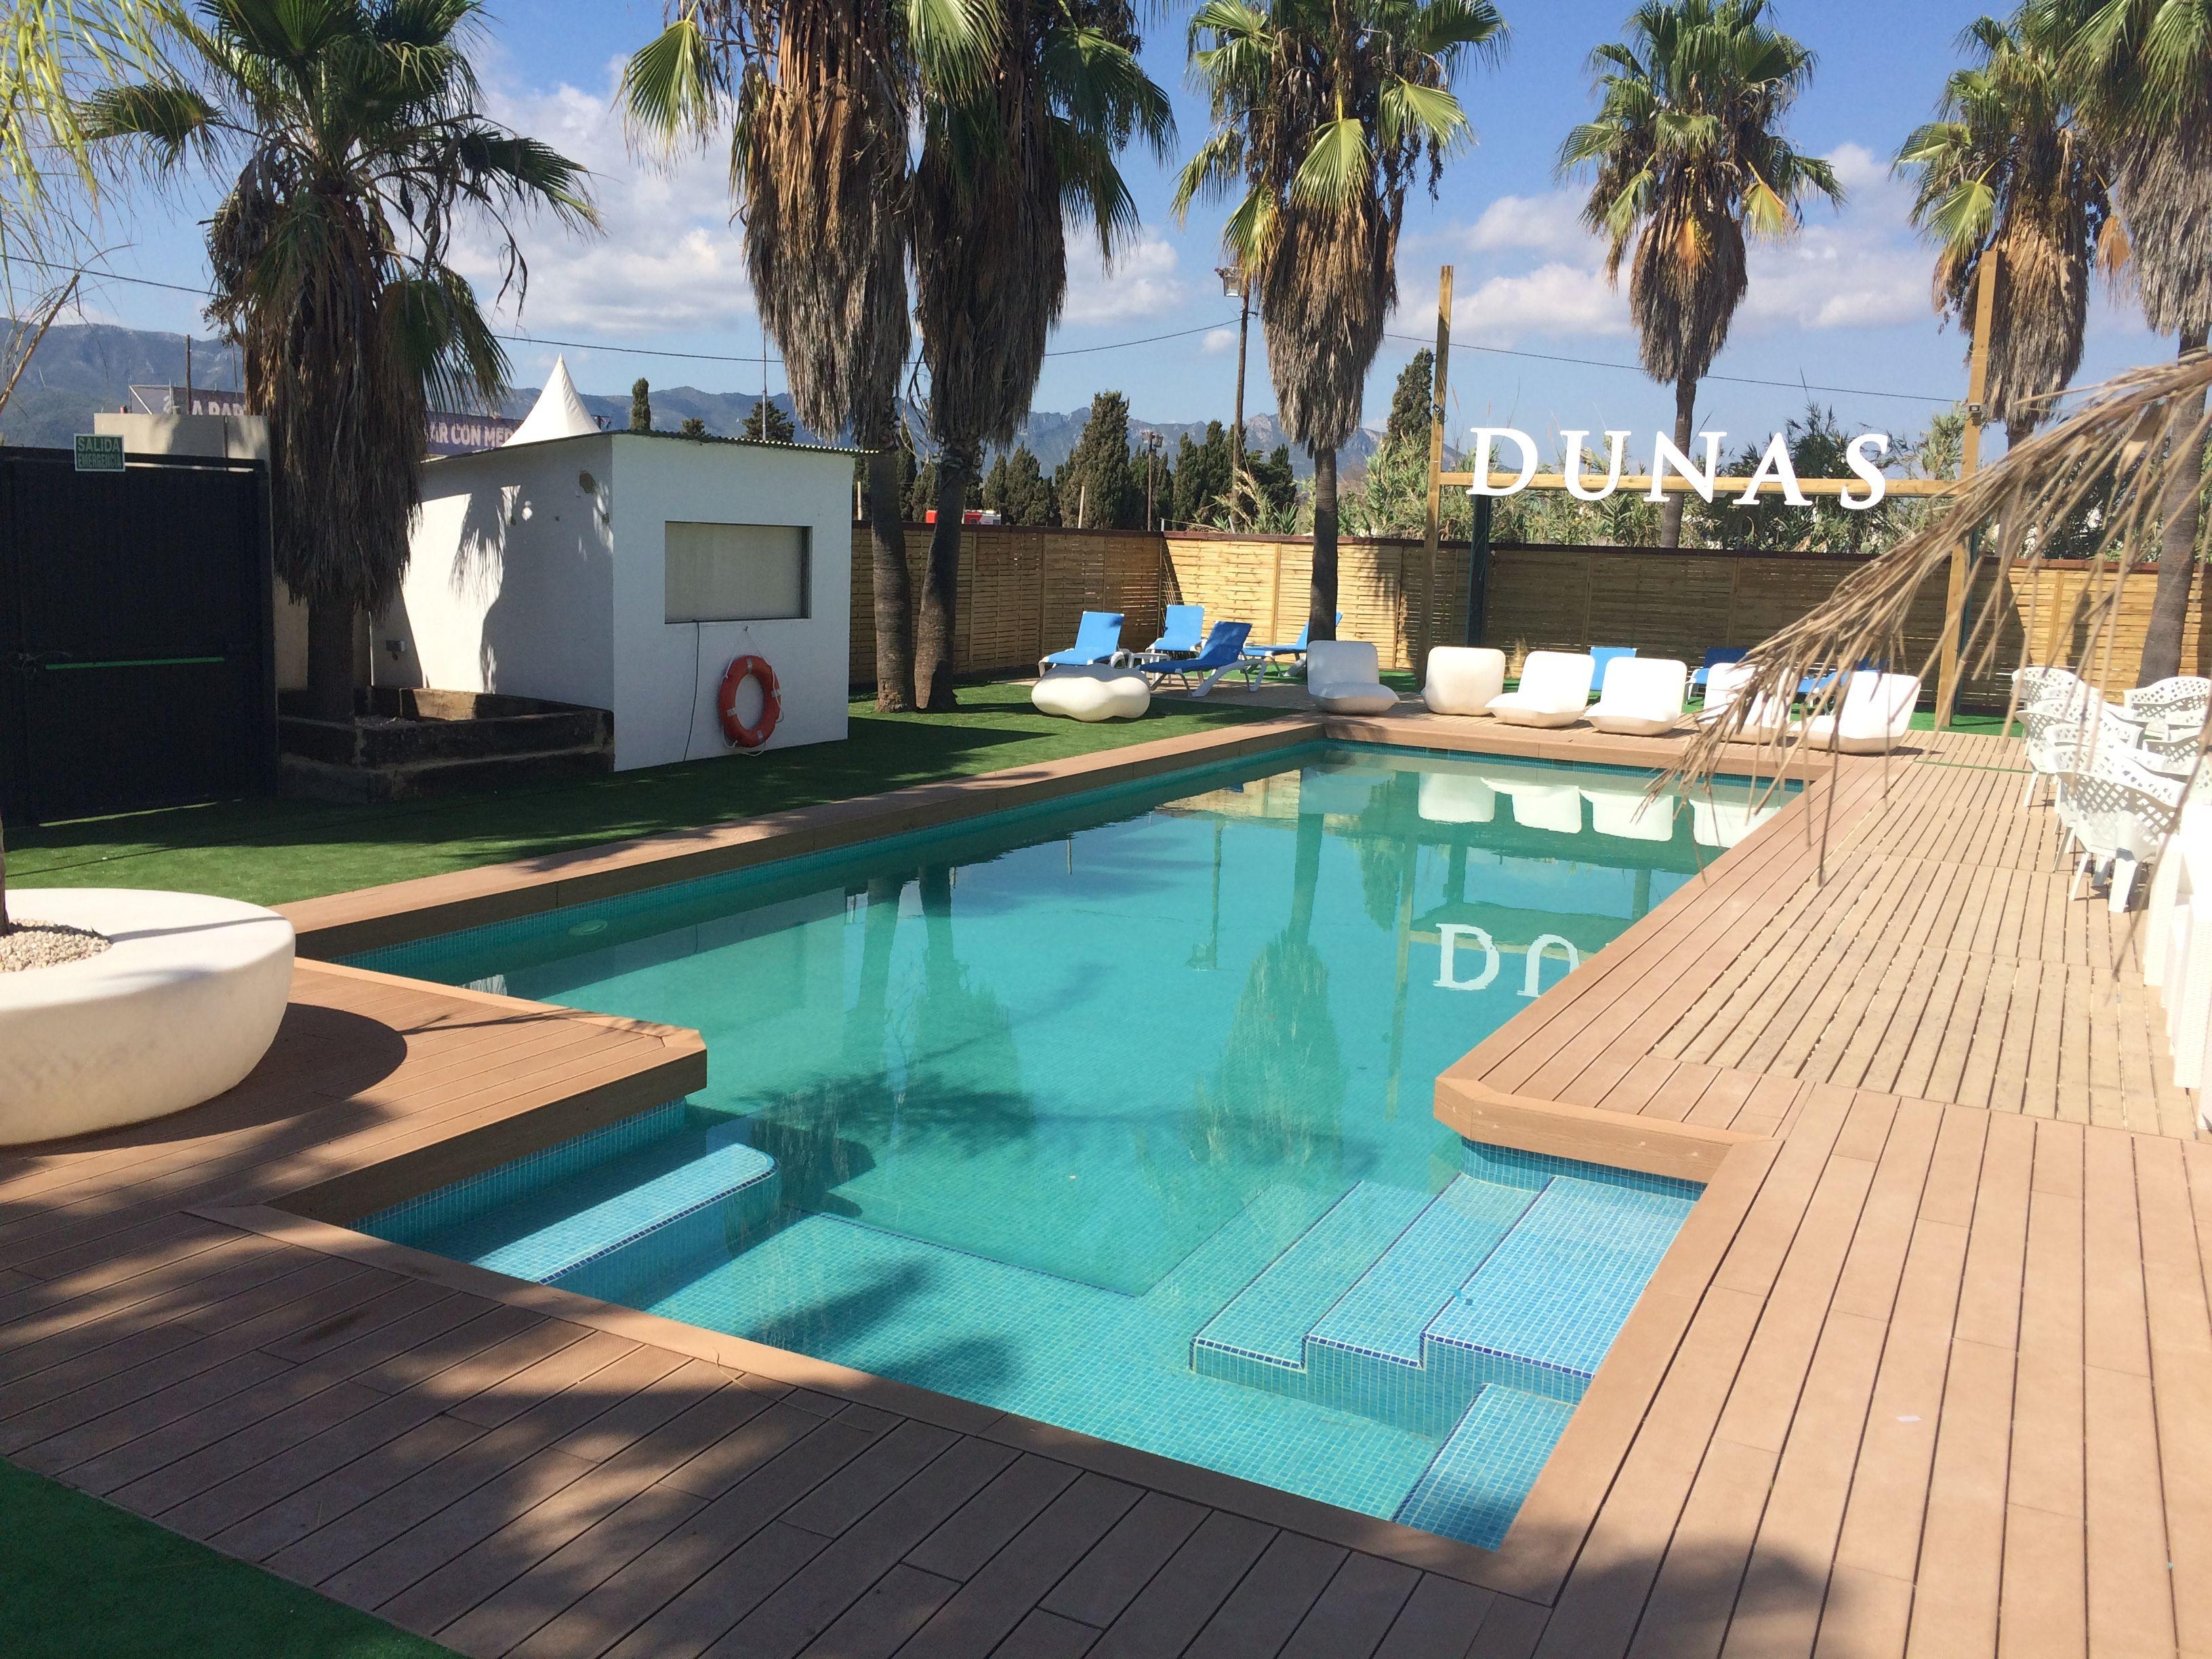 piscina de hormig n empresa valenciana especializada en